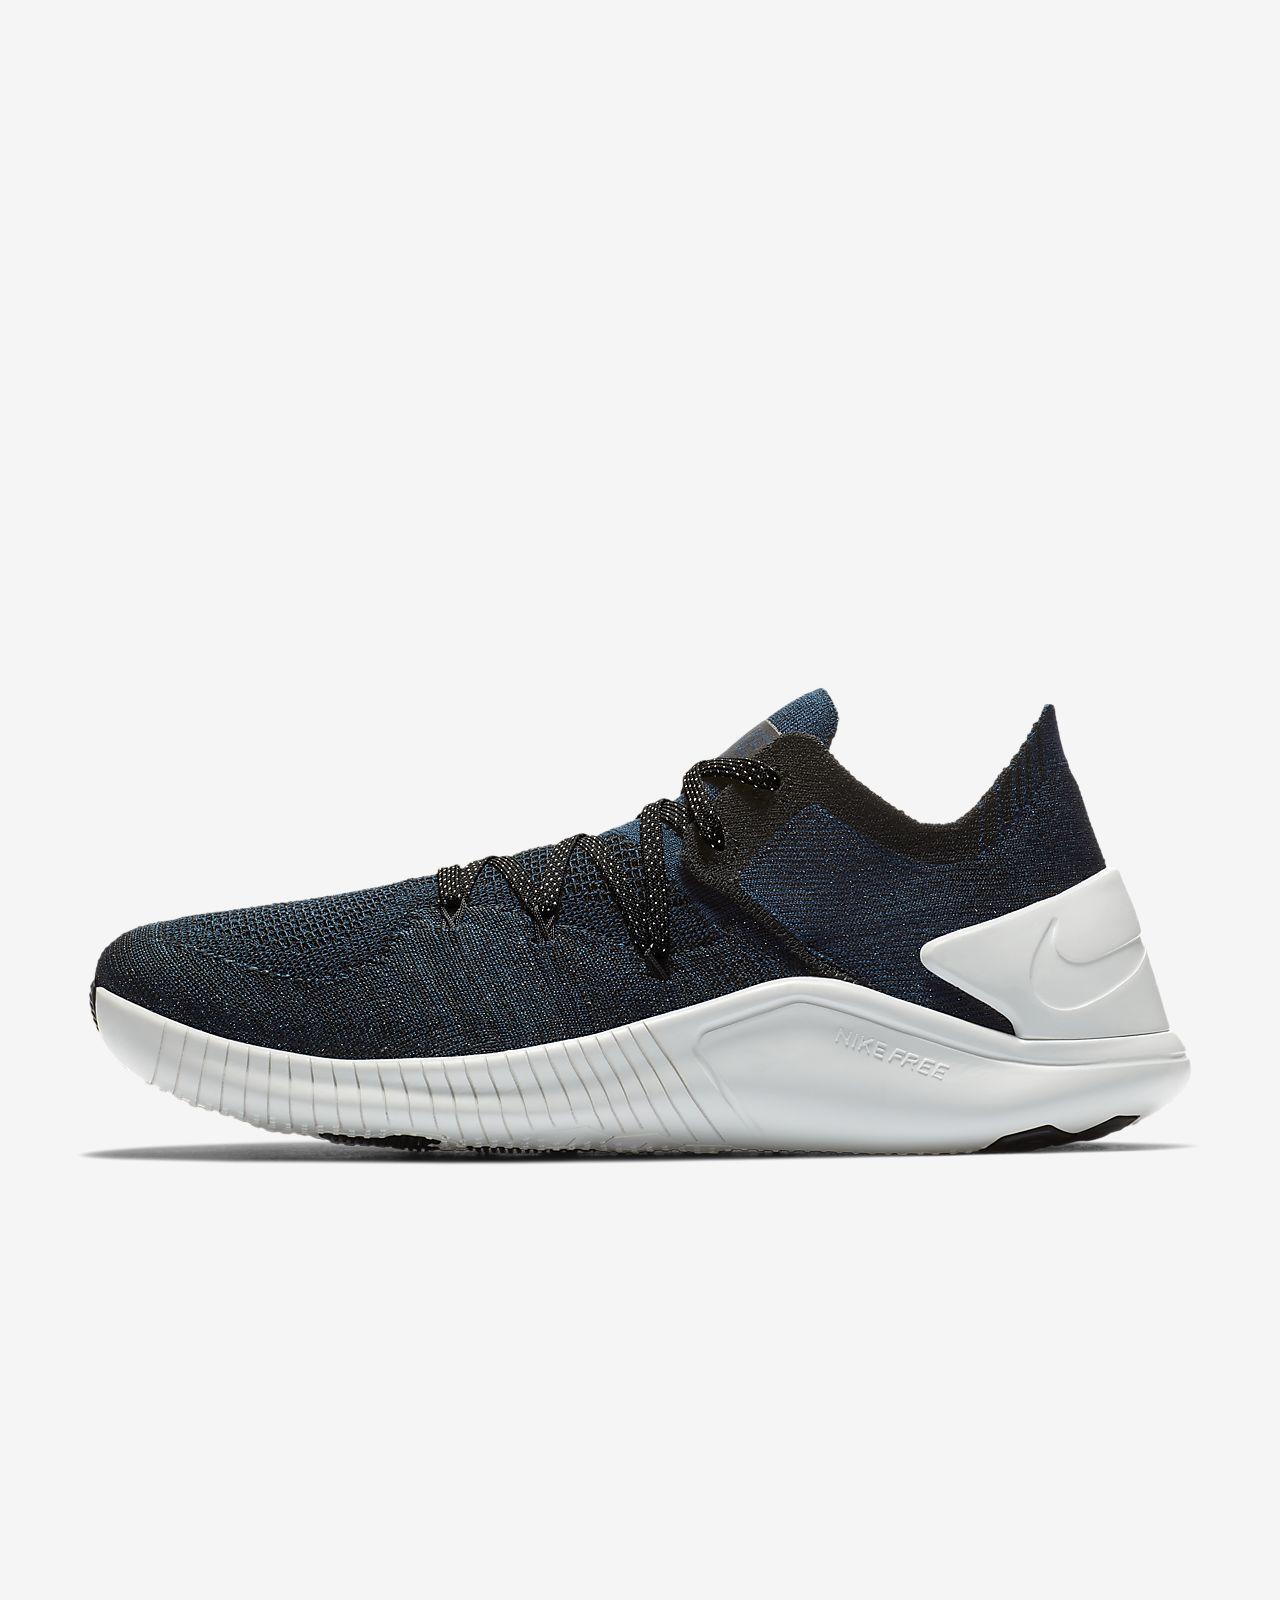 sports shoes e33cb abb36 Women s Training Shoe. Nike Free TR Flyknit 3 Metallic